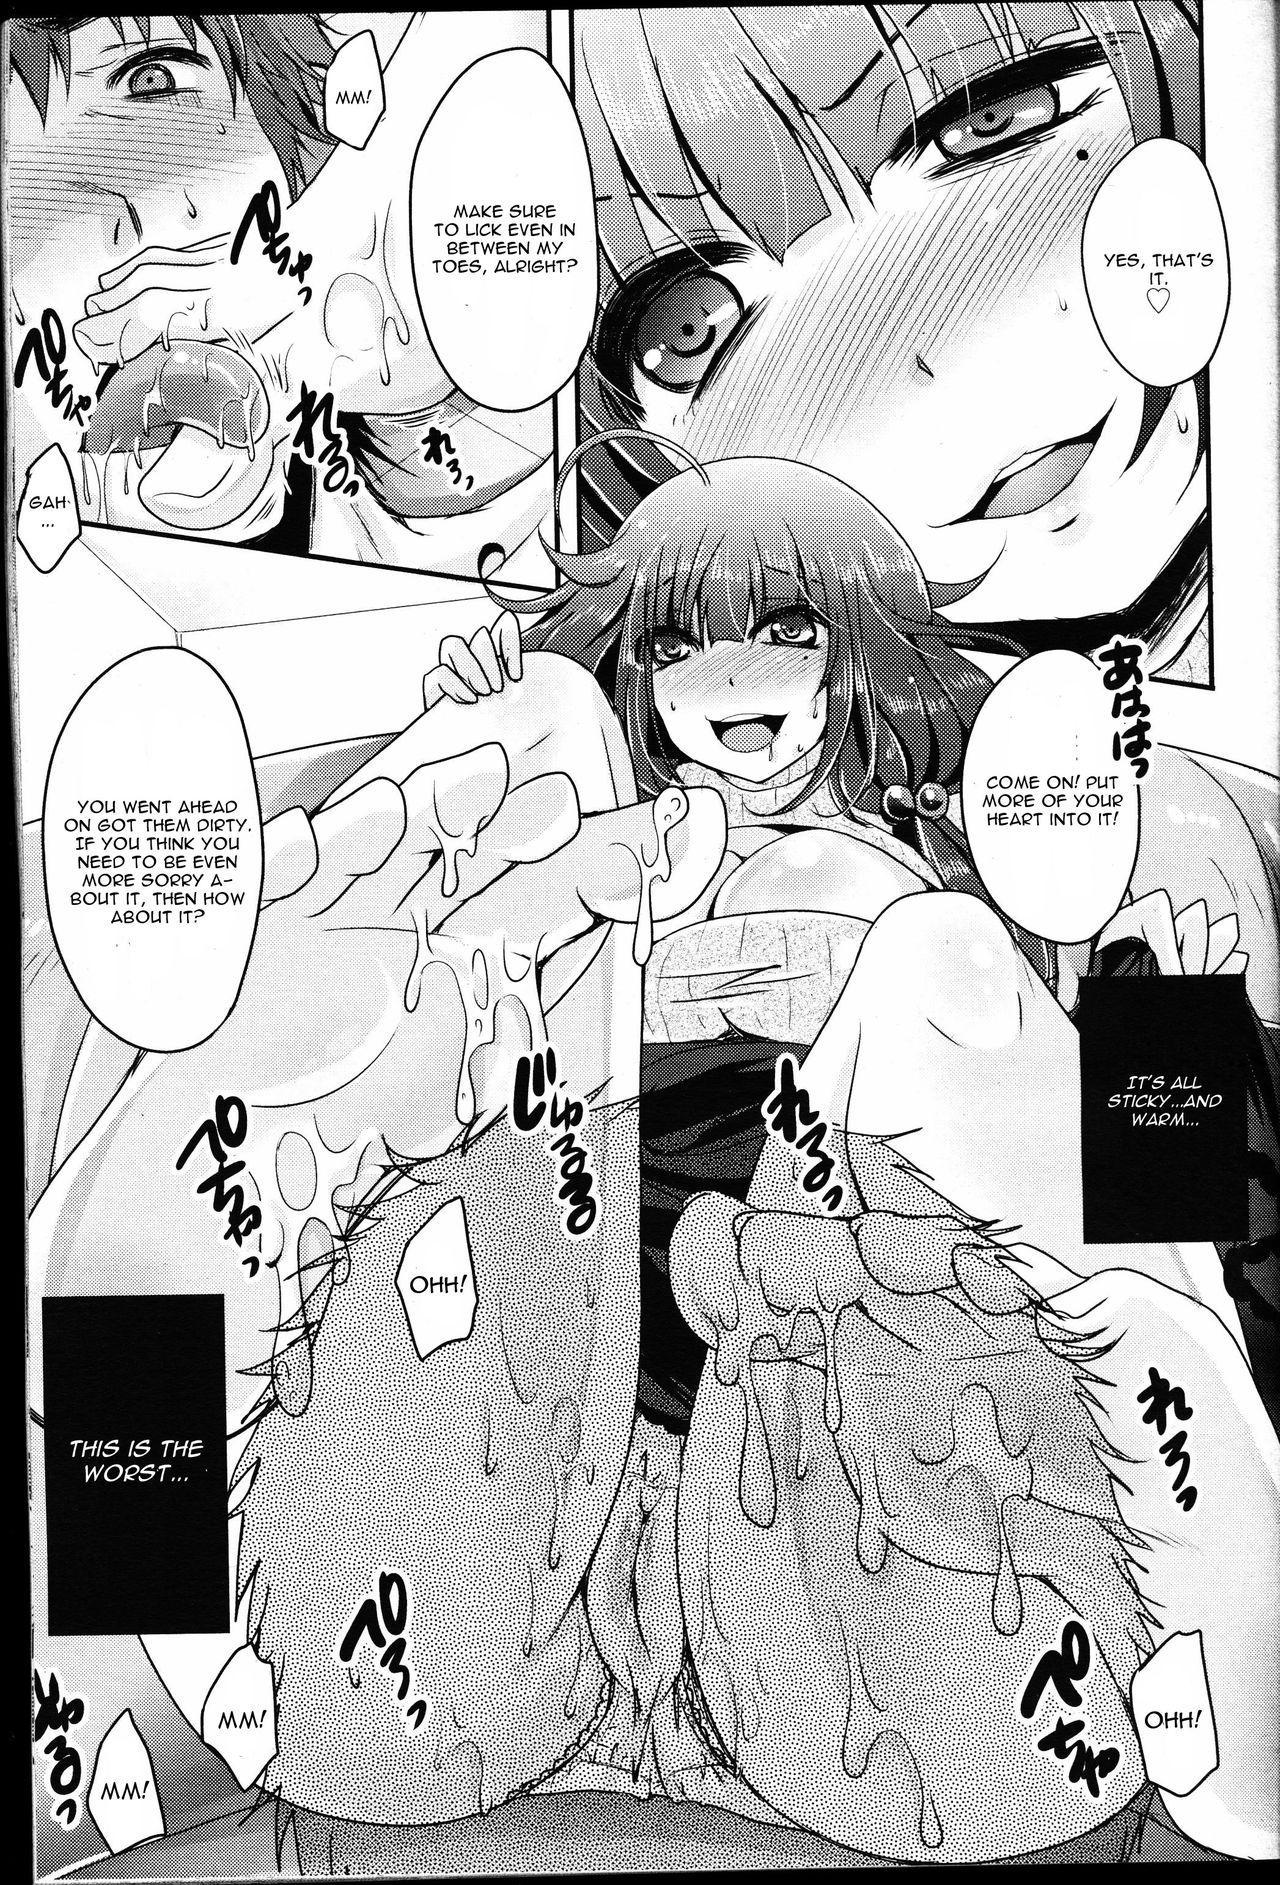 [Usubeni Sakurako] Henshuu-san to Eromangaka-chan (Girls forM Vol. 12) [English] [CGrascal] 10